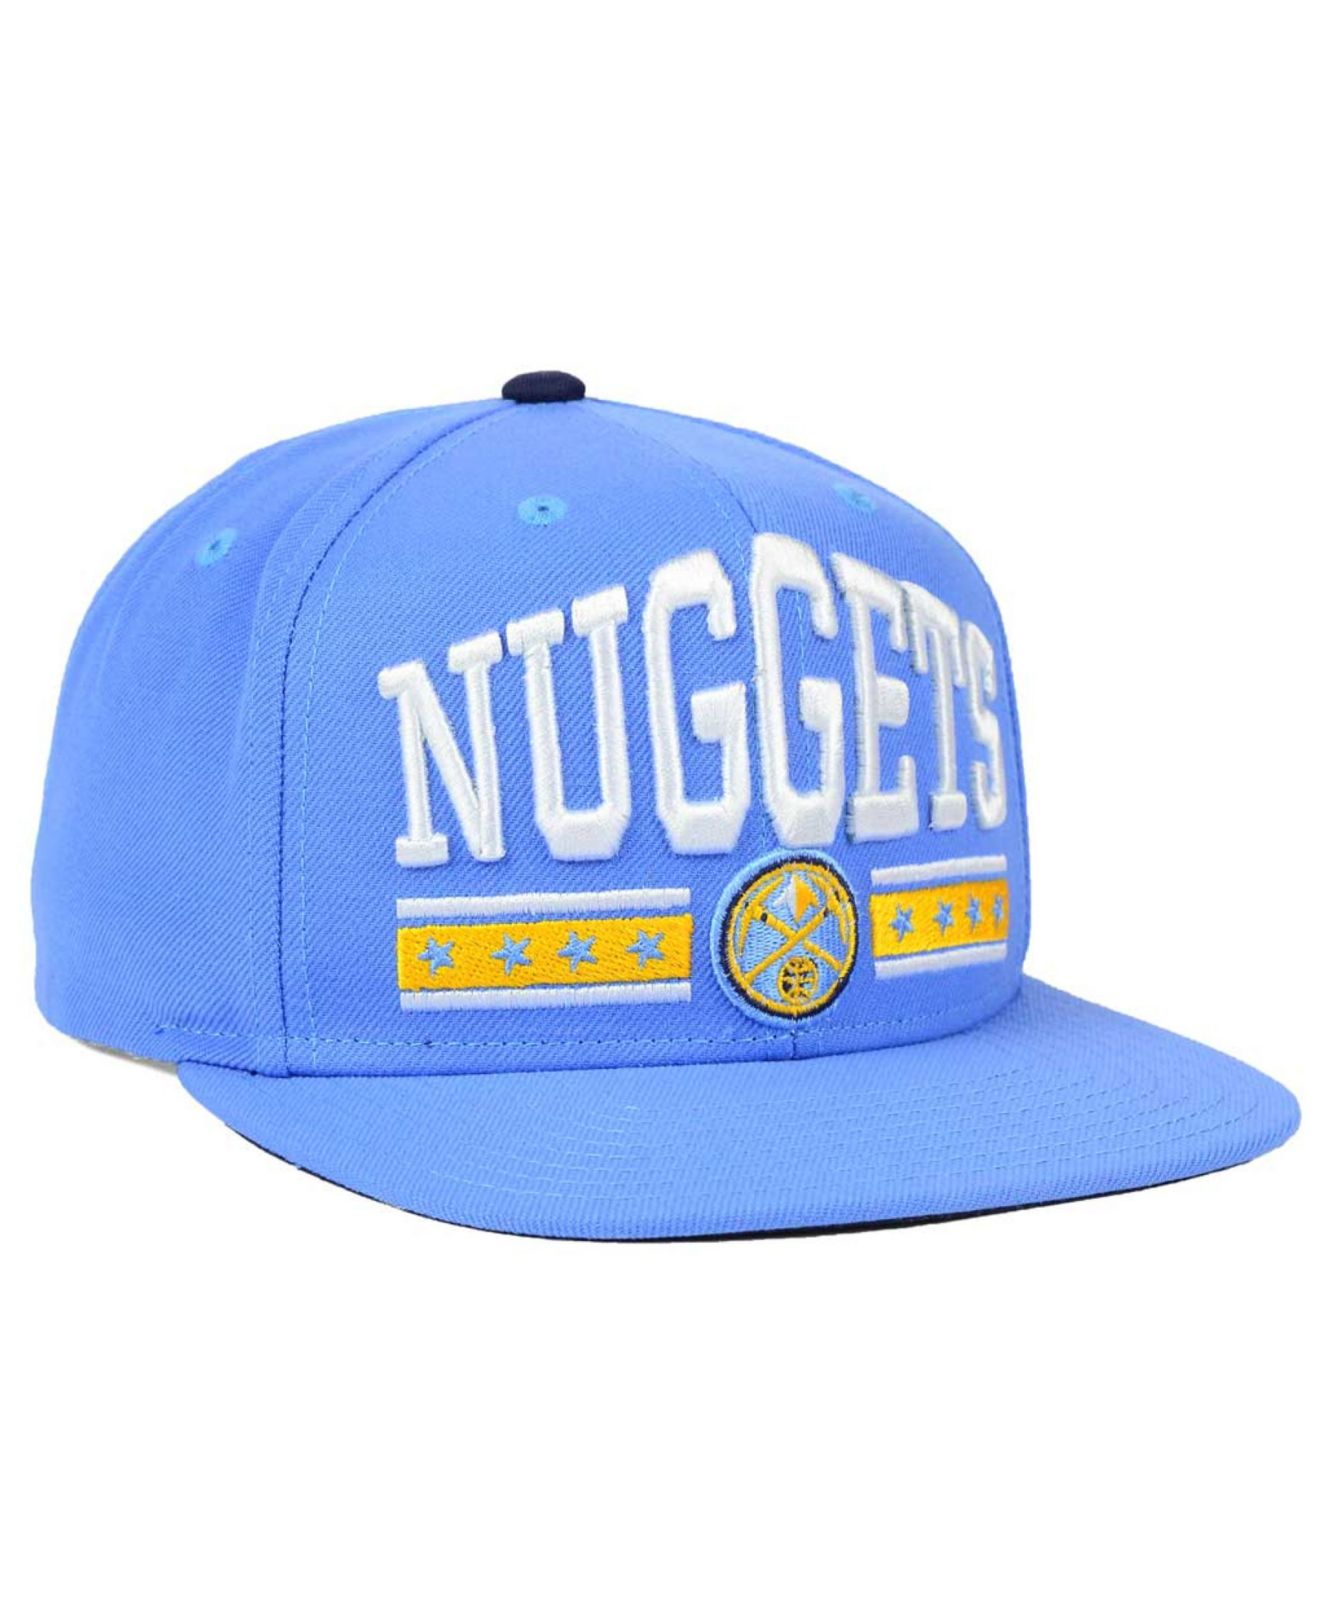 Sports Licensed Division Adidas Denver Nuggets Stars